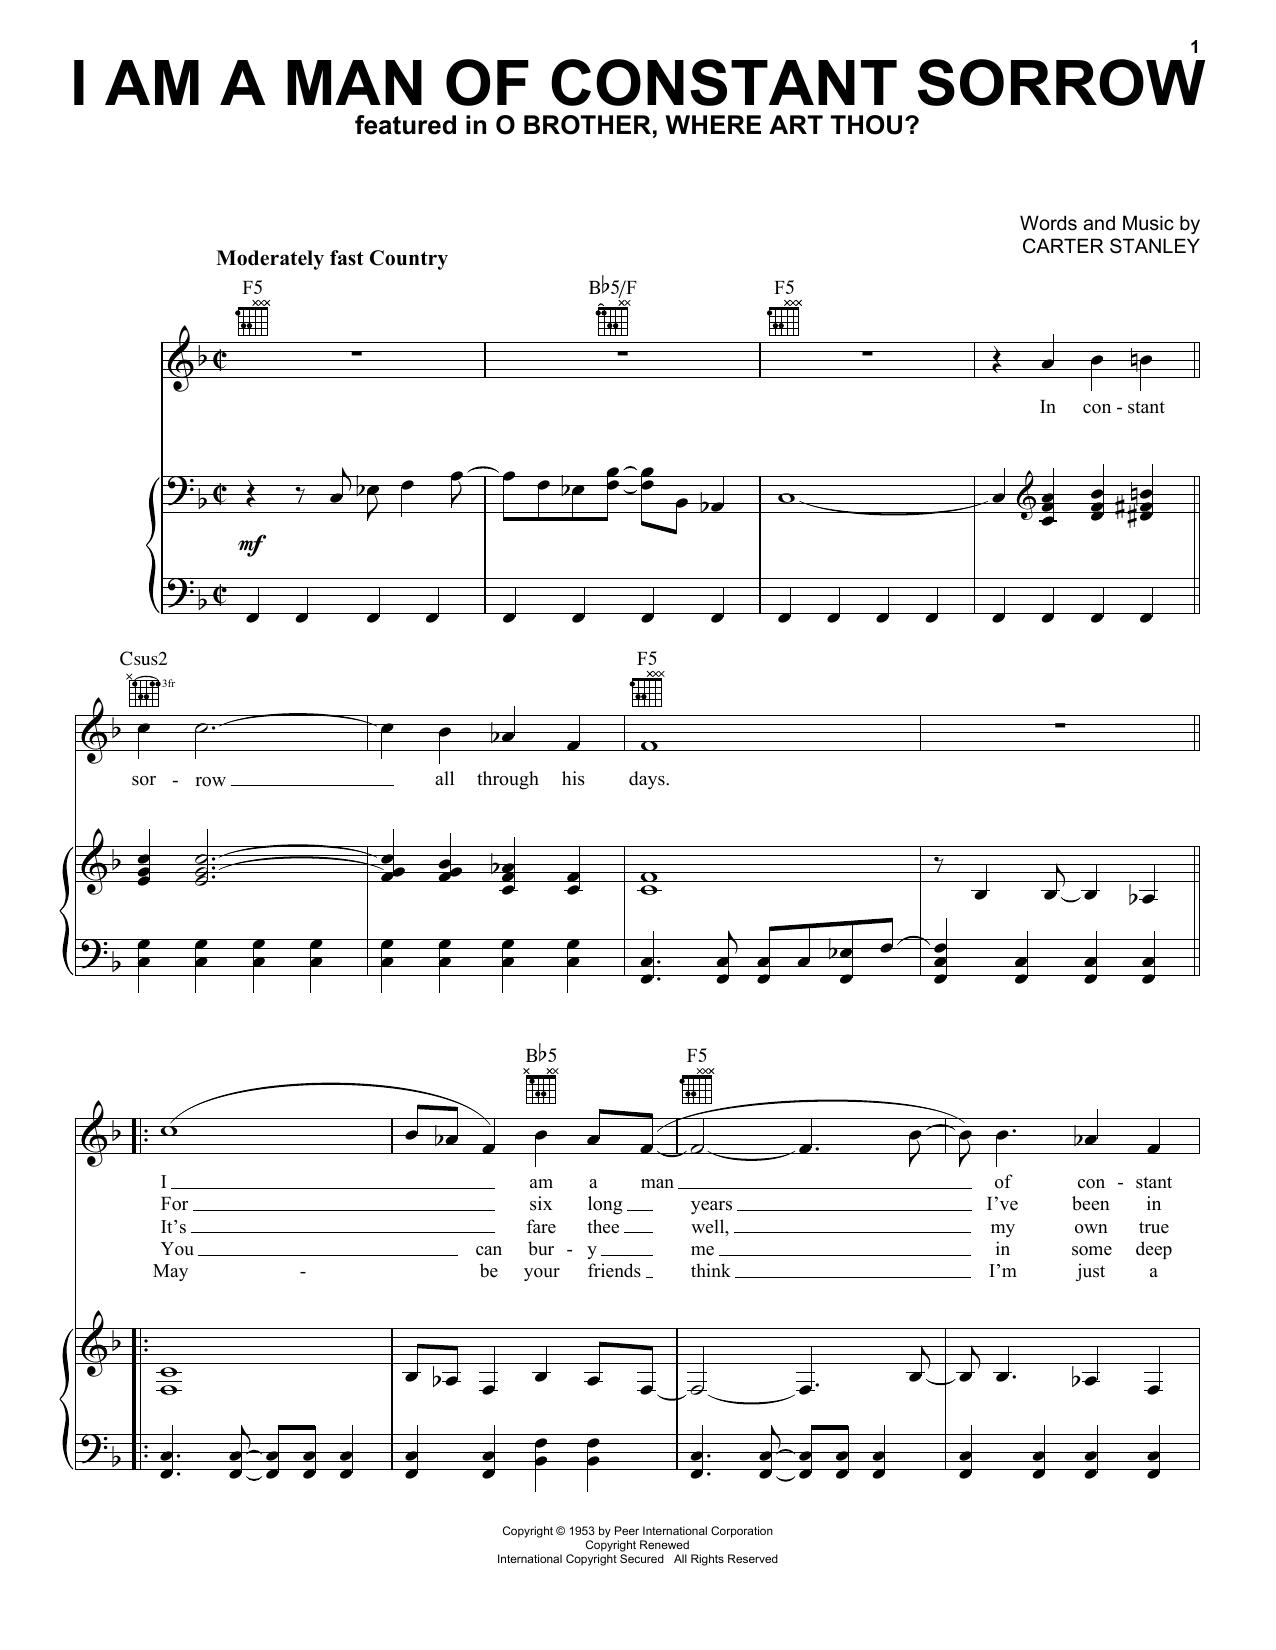 The Soggy Bottom Boys 'I Am A Man Of Constant Sorrow' Sheet Music Notes,  Chords   Download Printable Lyrics & Chords   SKU 15